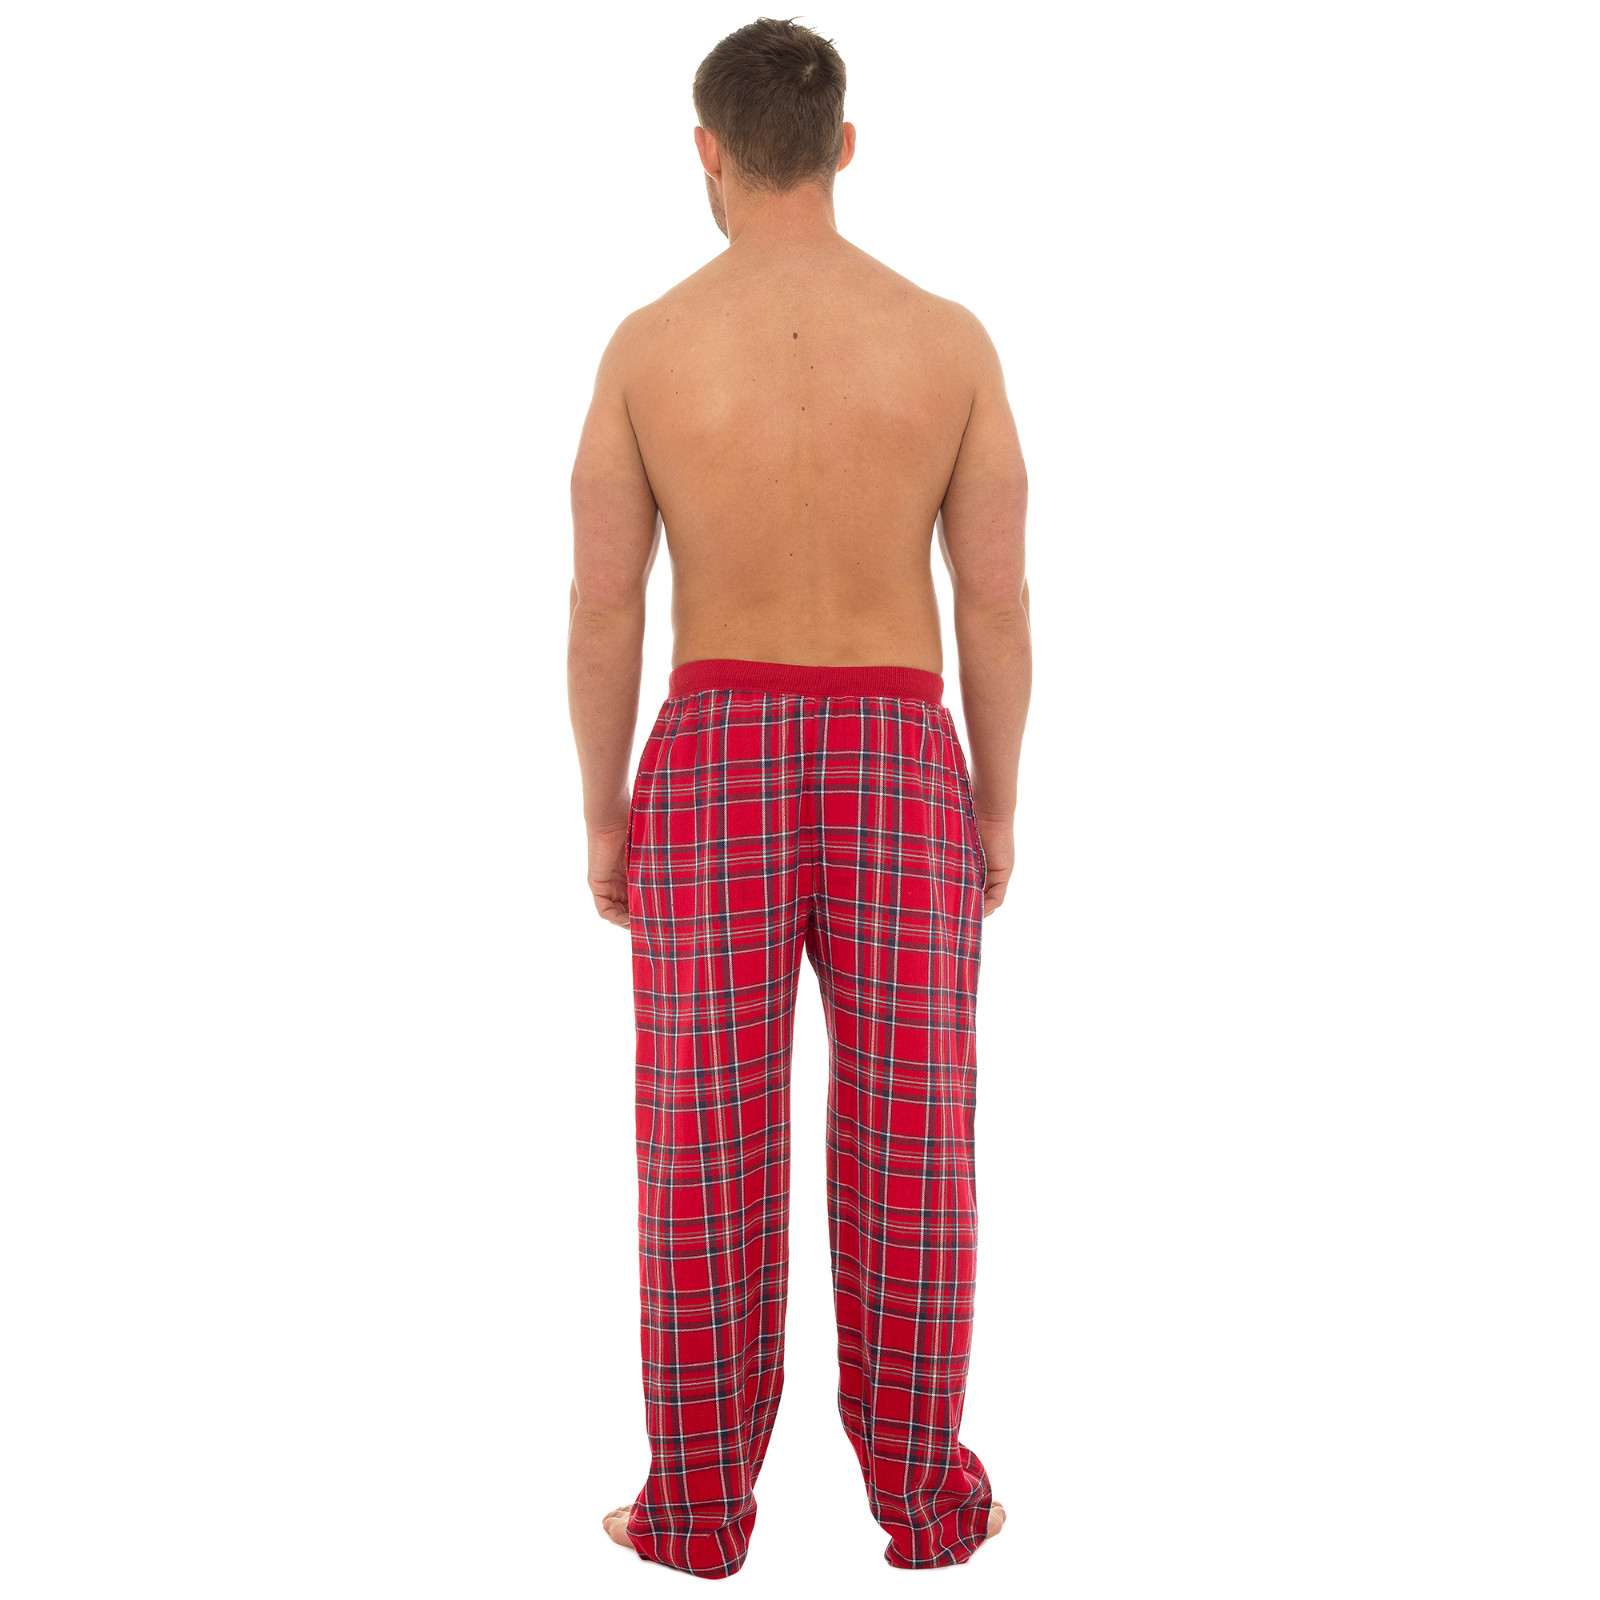 Mens 100/% Cotton Lounge Pants Casual Nightwear Pyjama Bottoms Xmas Gift Size